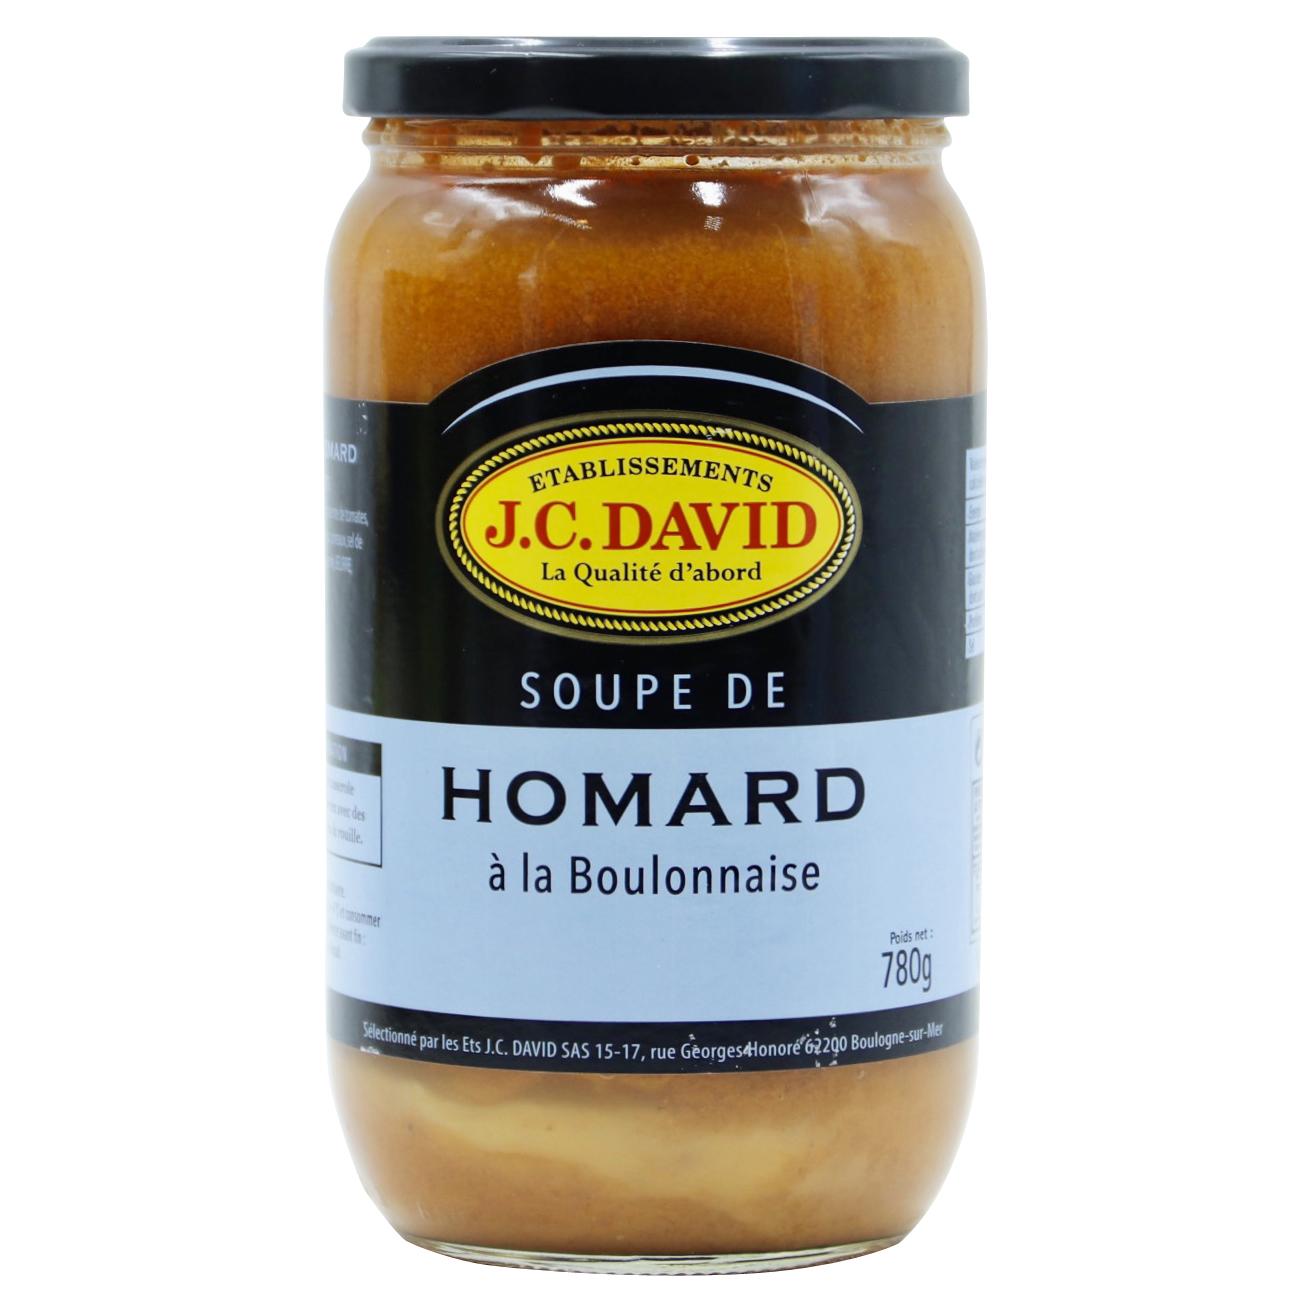 SOUPE DE HOMARD - 780 g